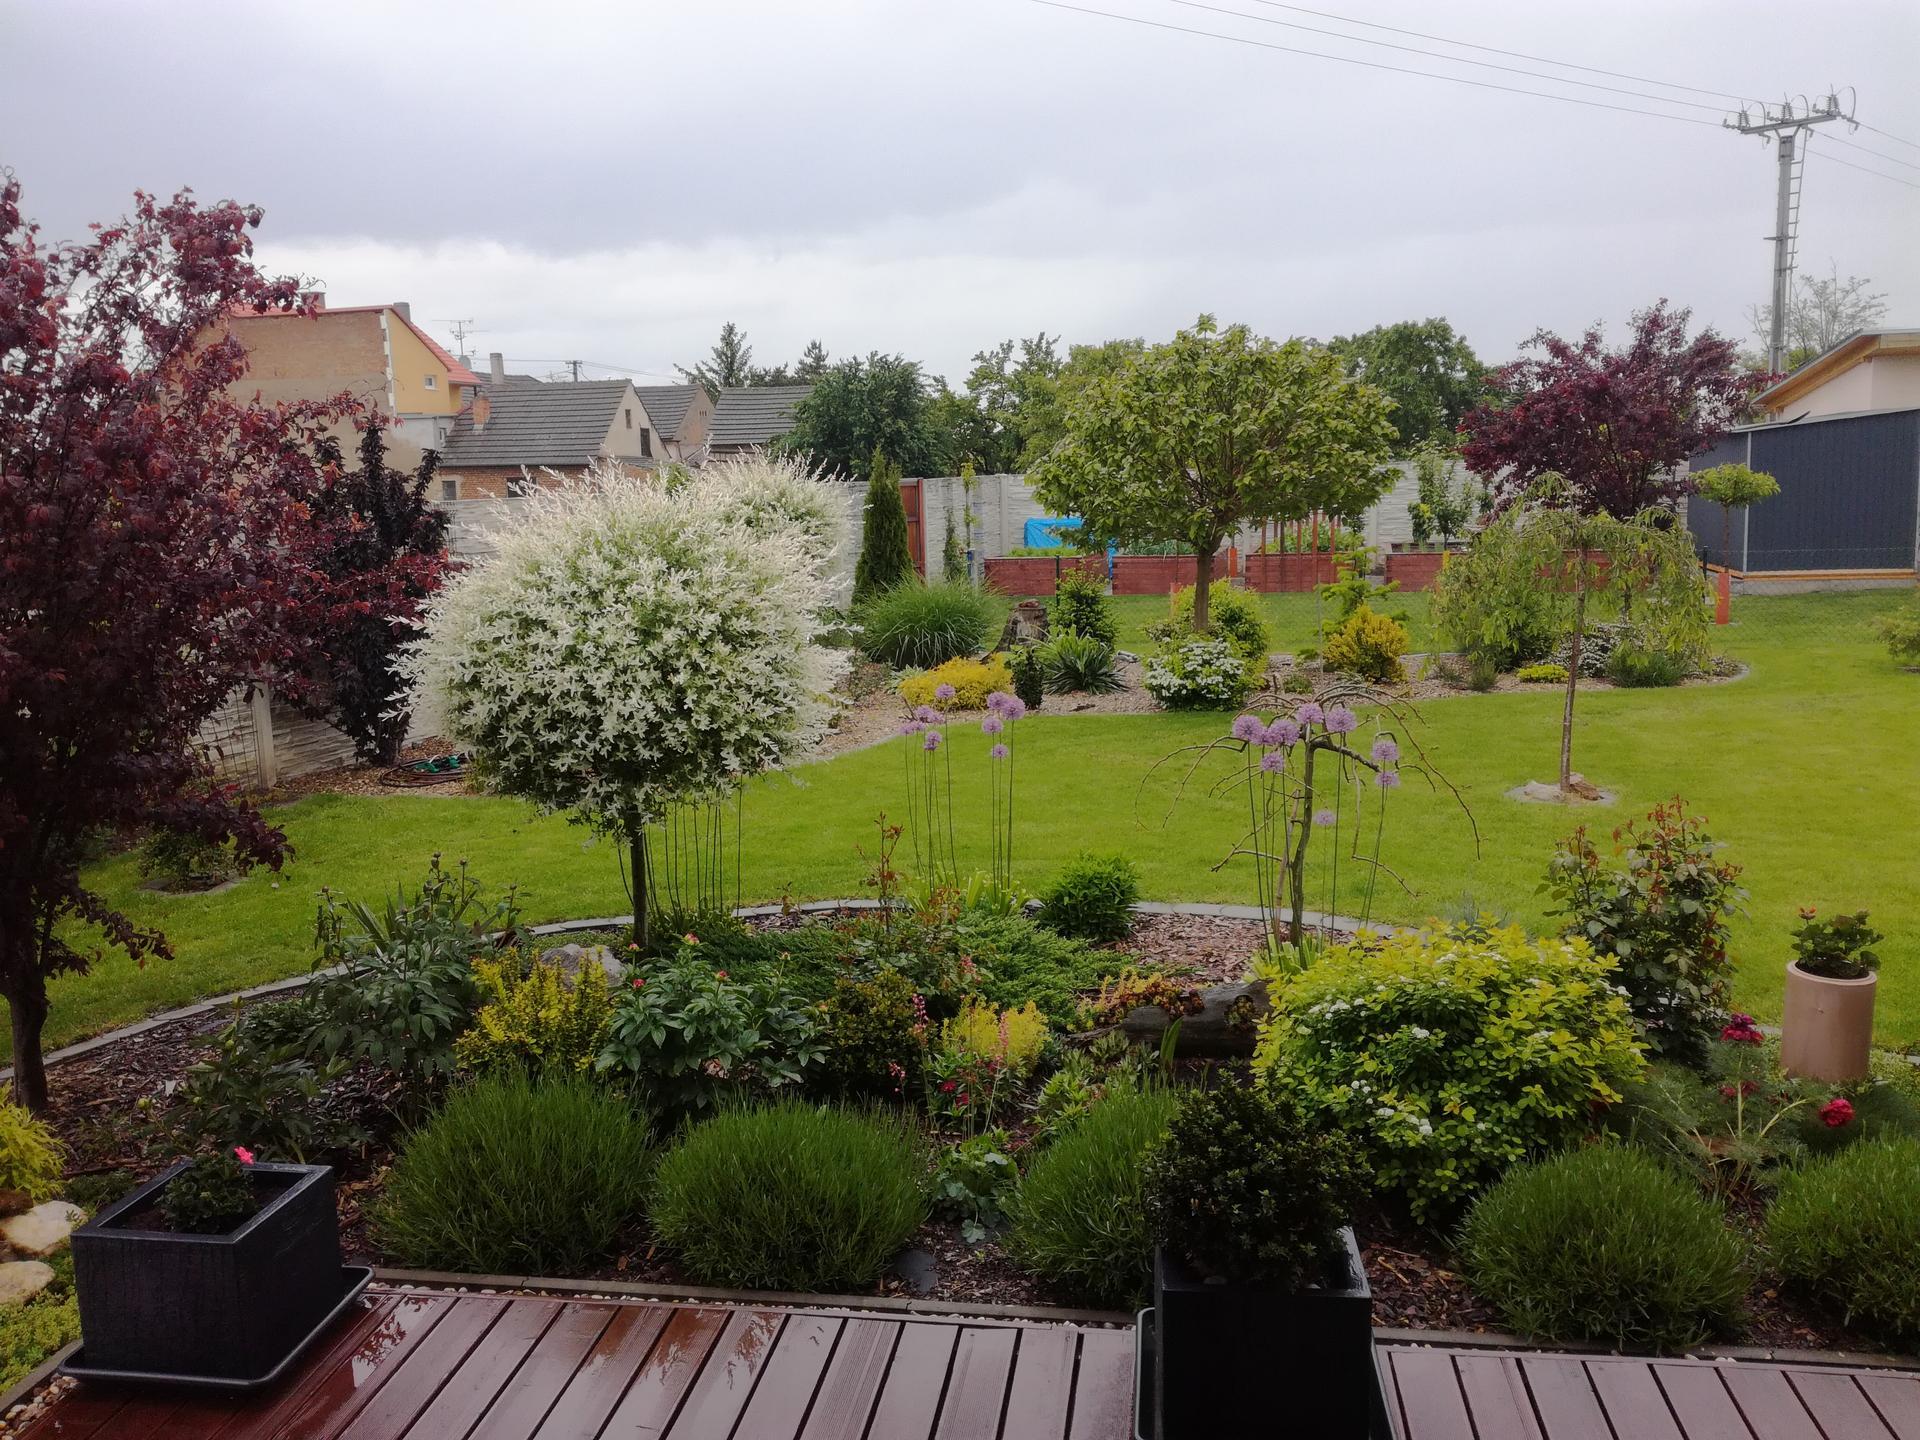 Zahrada 2021 🌲 - Obrázek č. 96